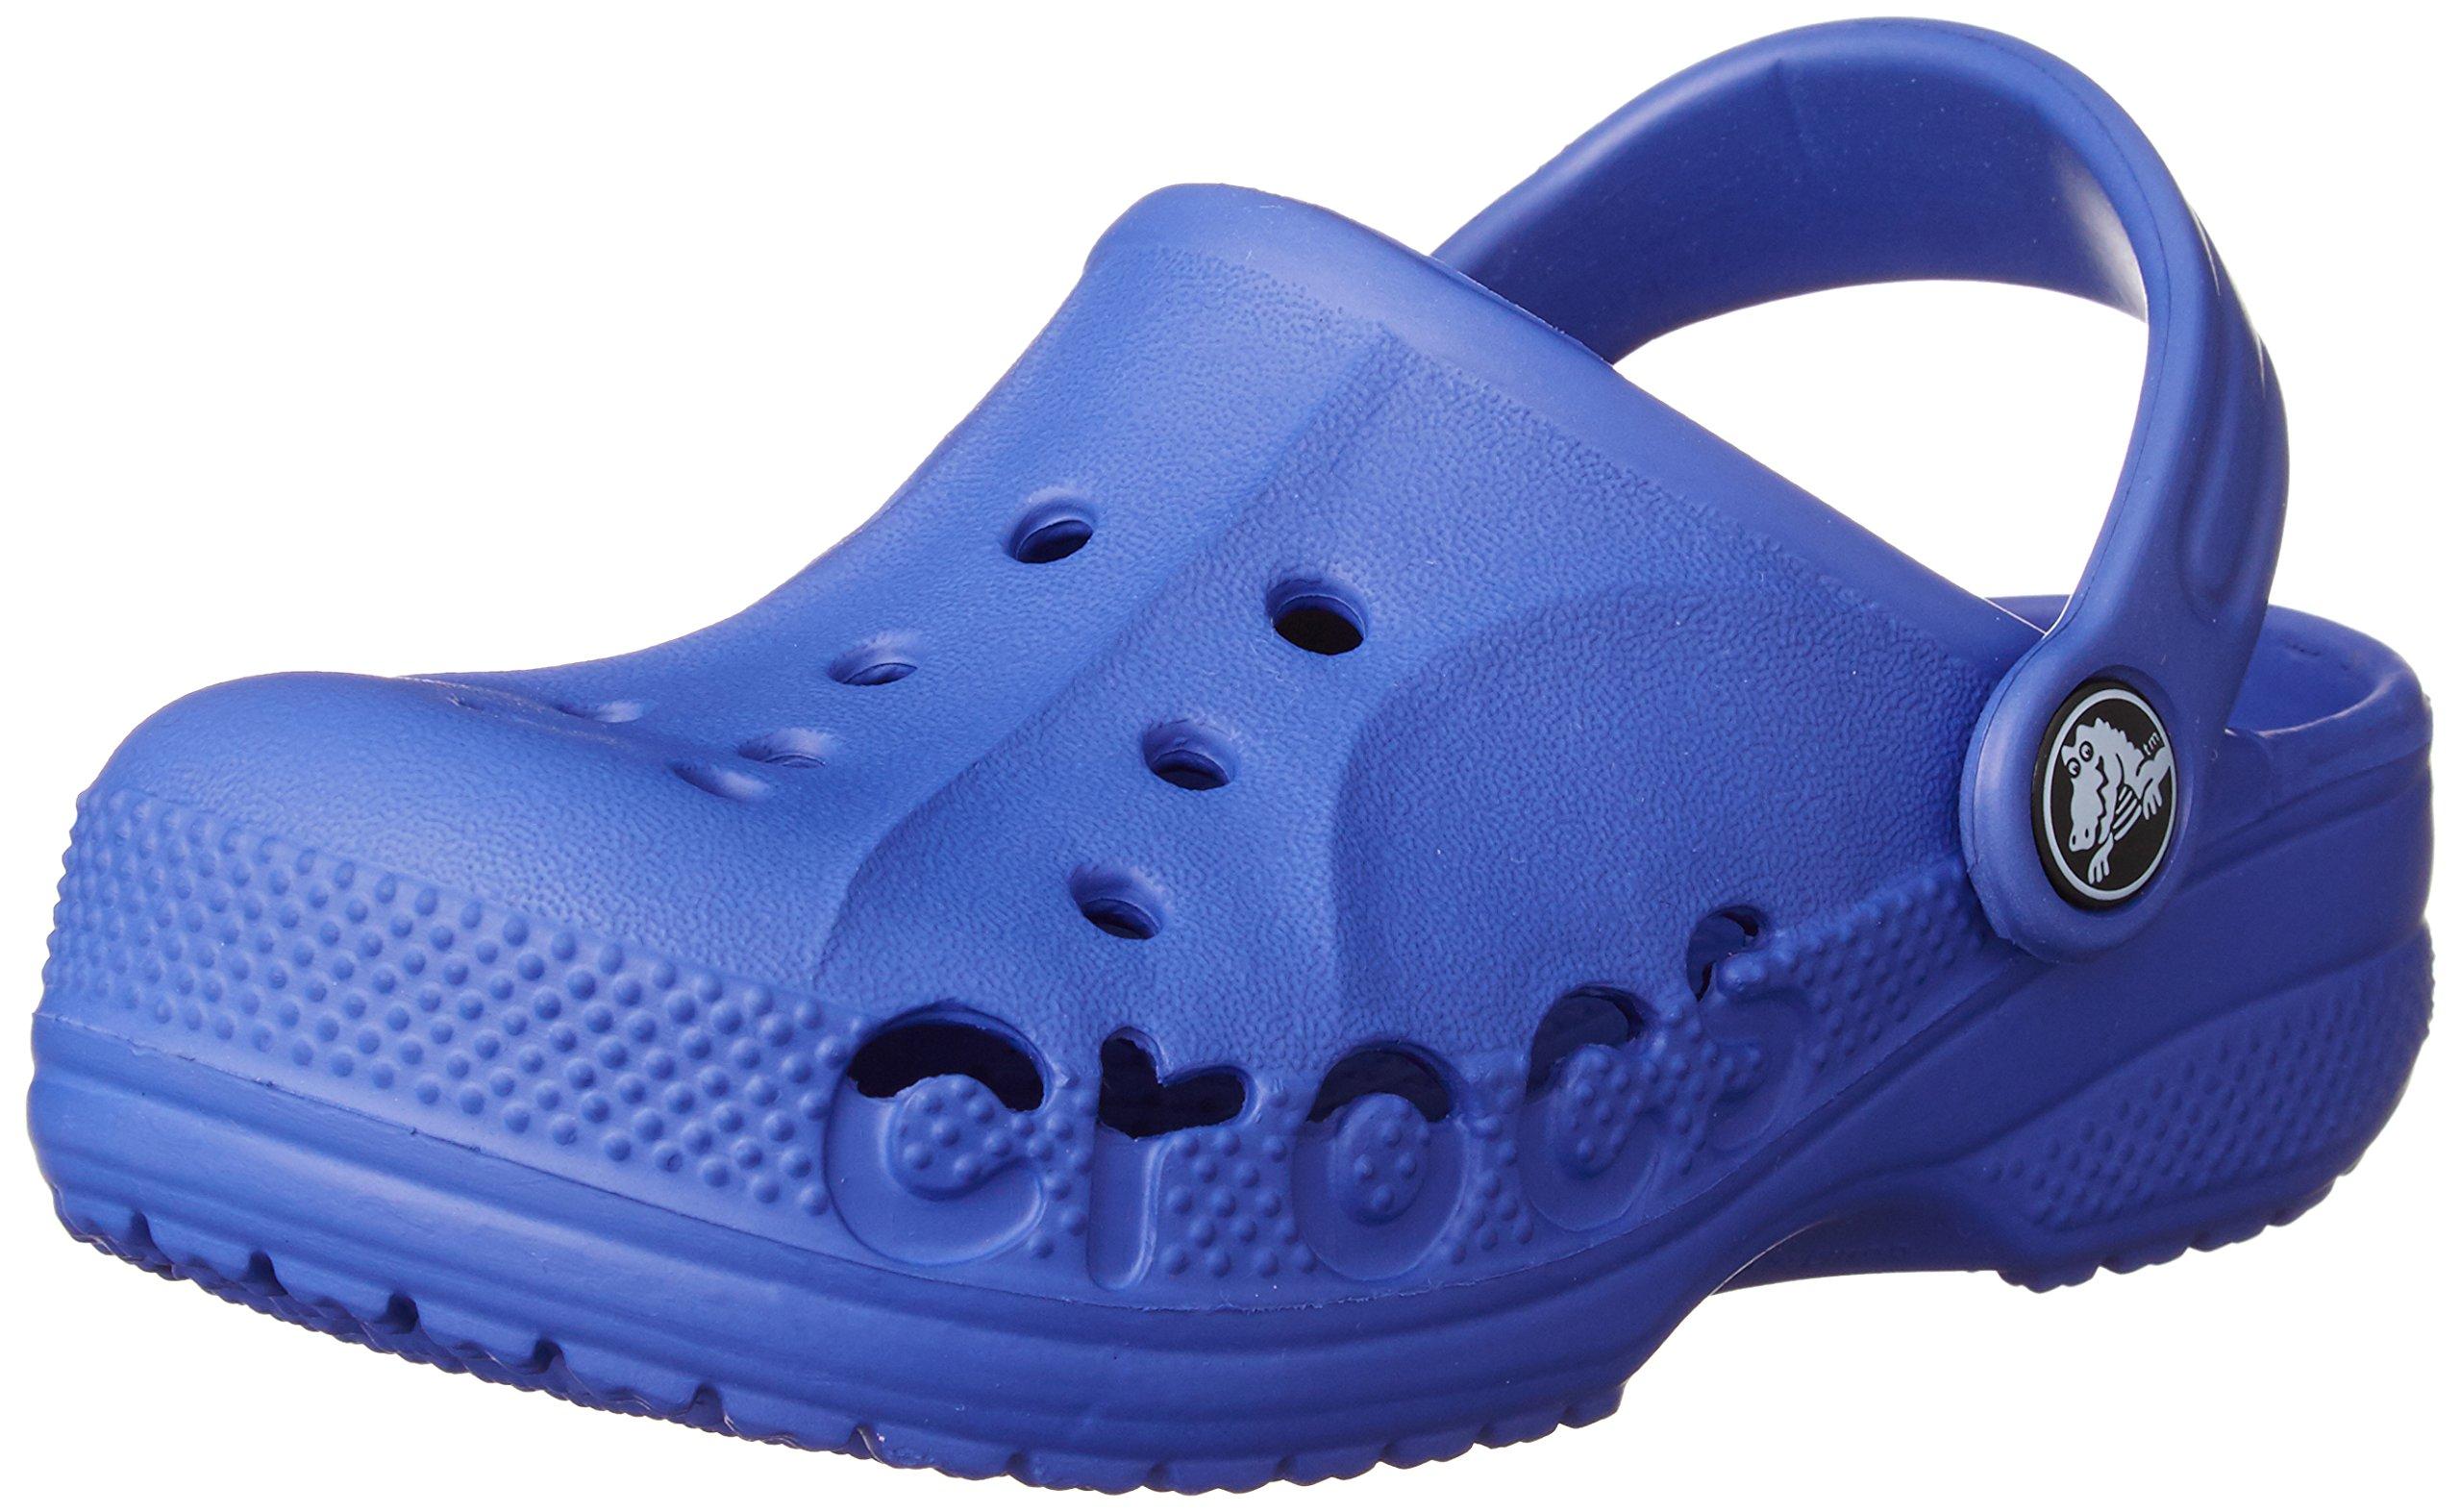 Crocs Boys Baya Kids Clog, Cerulean Blue, 3 M US Little Kid